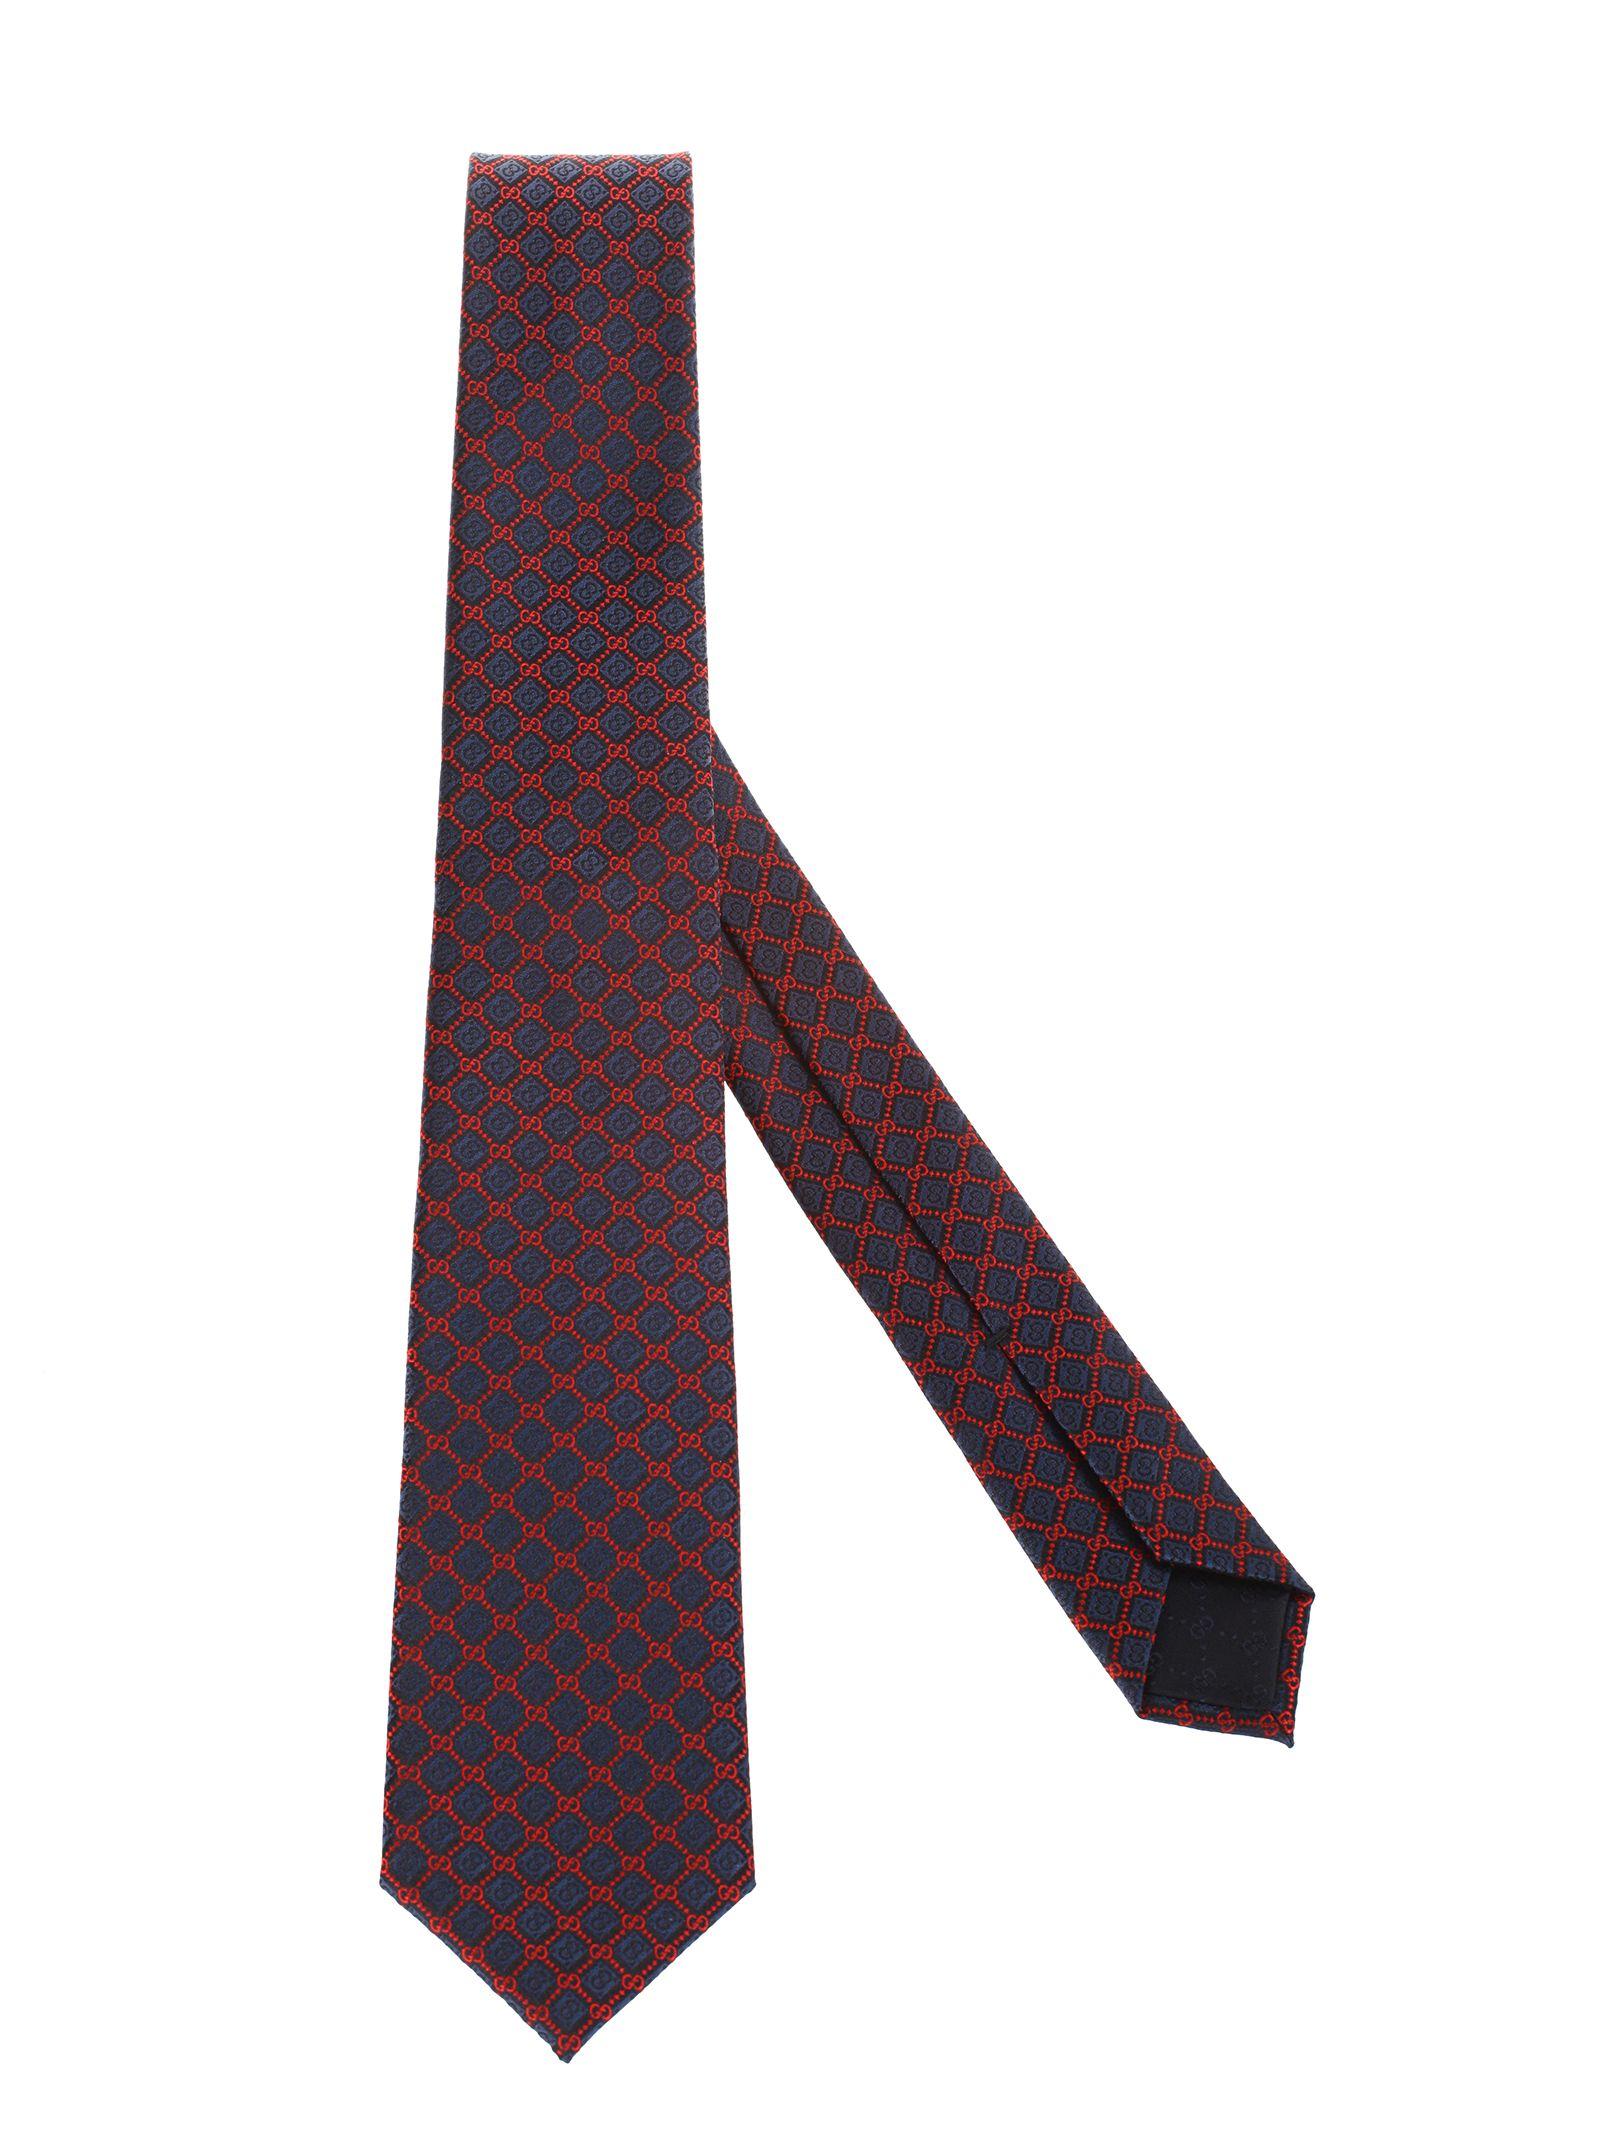 6674d4f3e Gucci Gucci silk jacquard tie - Blu - 10977947 | italist